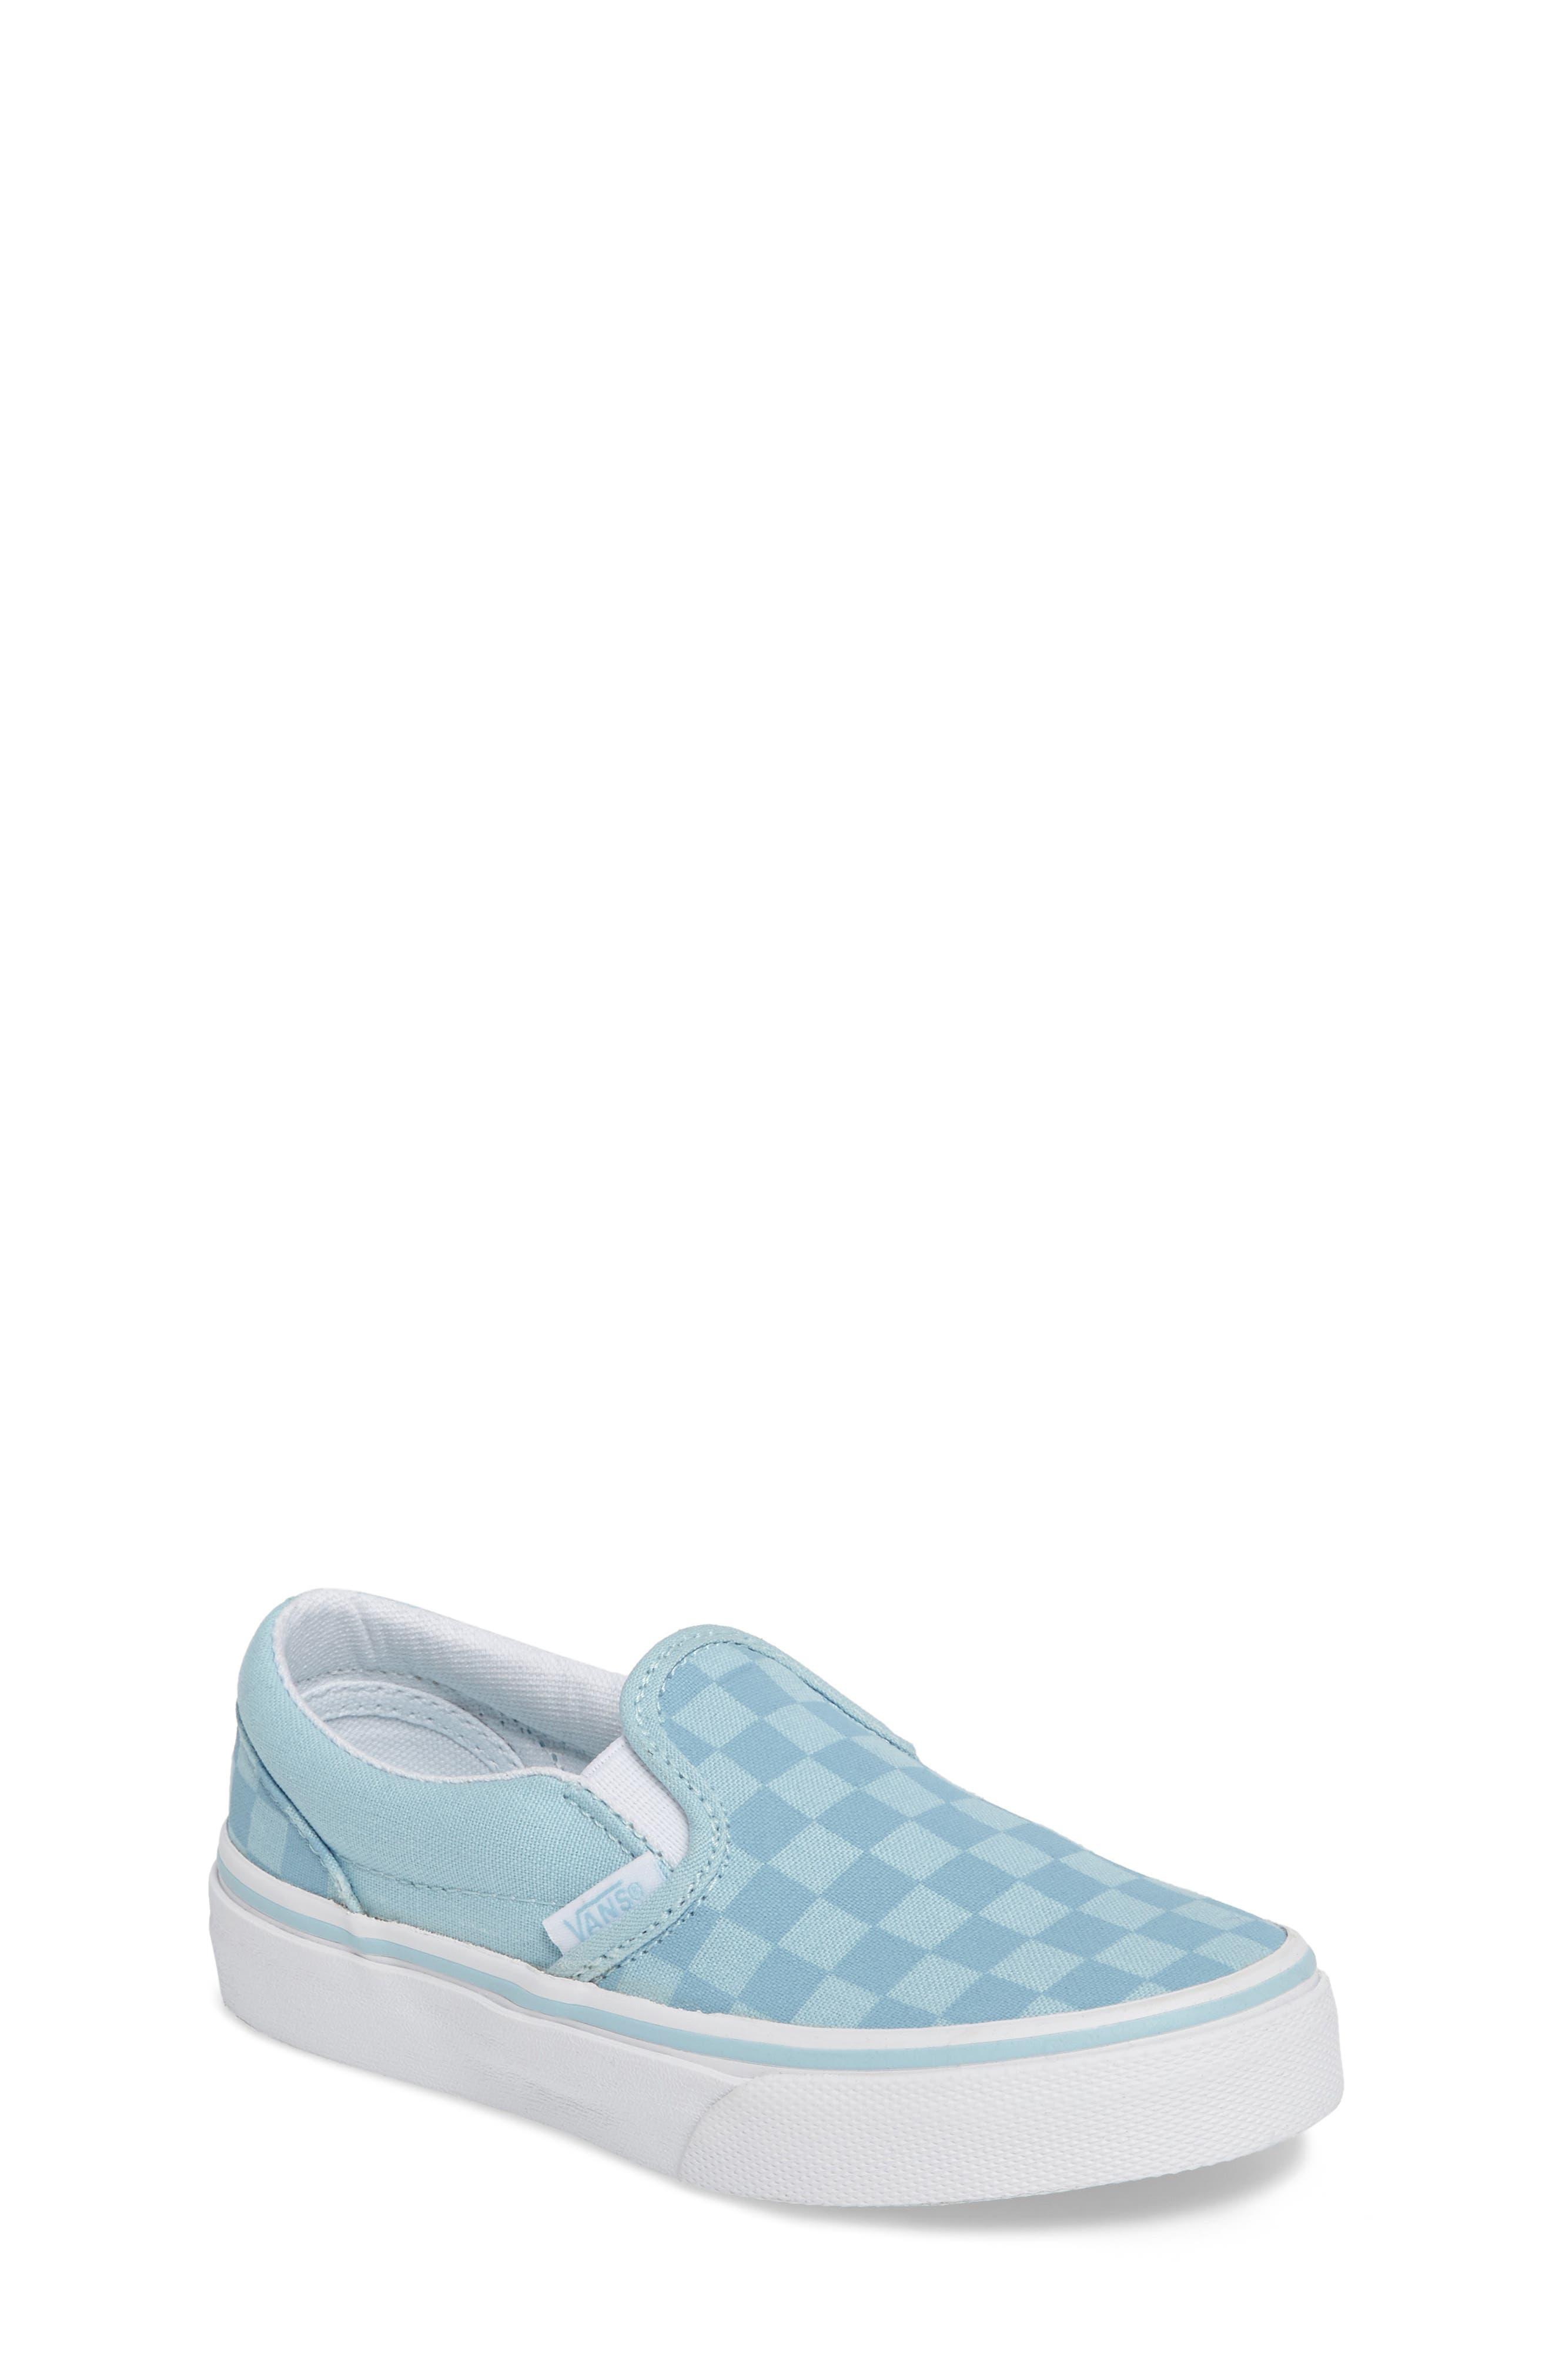 Main Image - Vans Classic Slip-On Sneaker (Walker, Toddler, Little Kid & Big Kid)